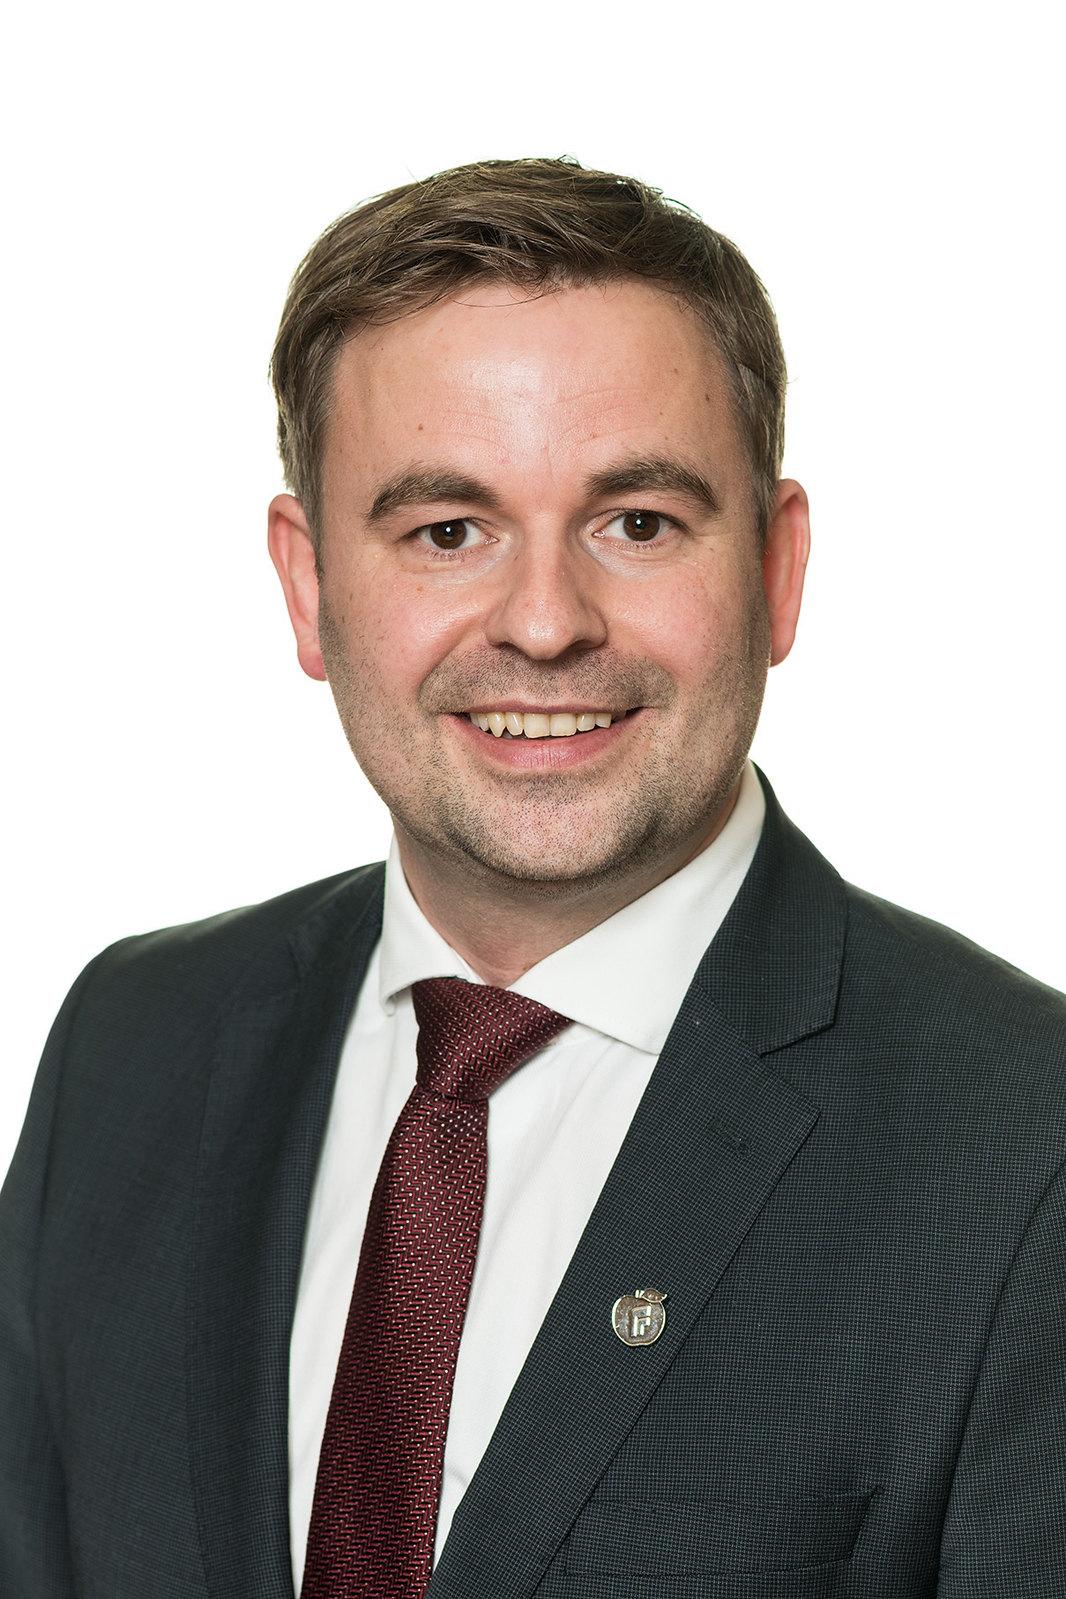 Statssekretær i Samferdselsdepartementet Allan Ellingsen (FrP)  Foto: Olav Heggø